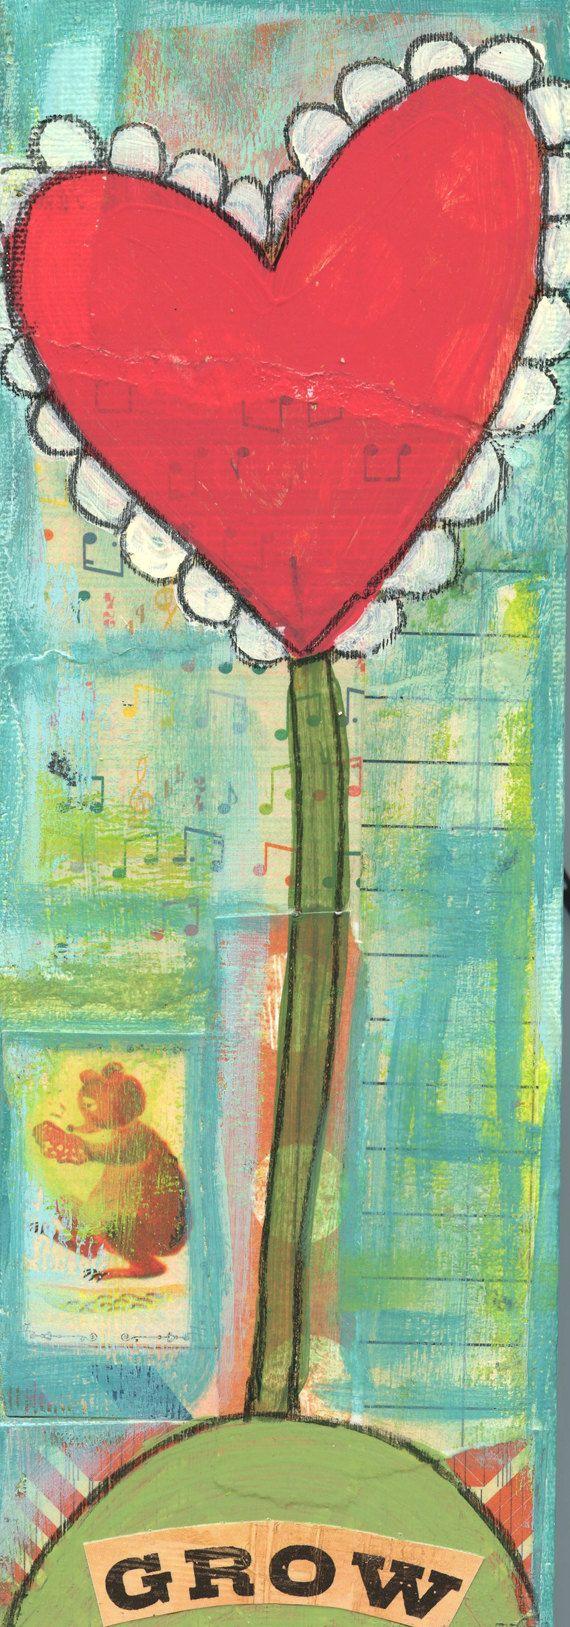 grow+happiness+flower+original+set+of+paintings+by+bettyandmaude,+$40.00